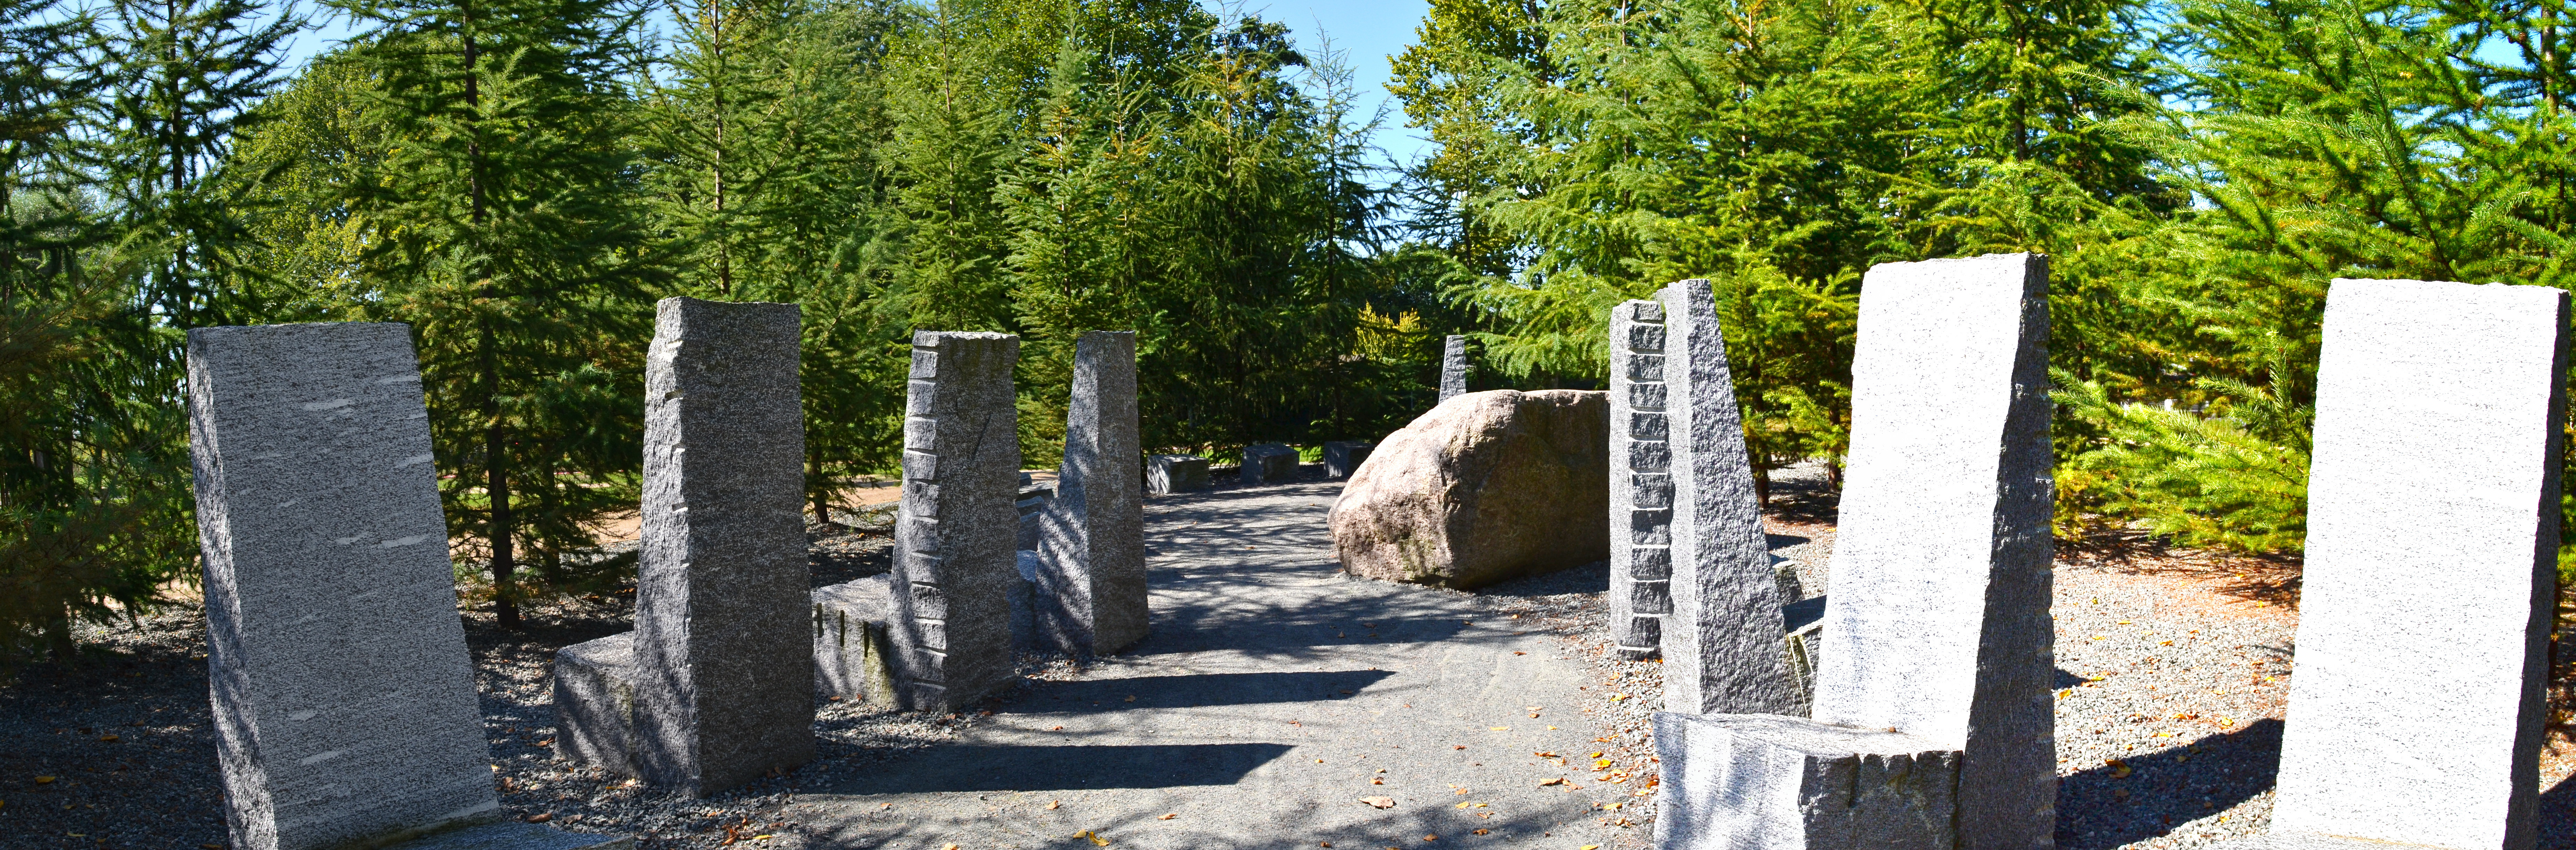 File:Gartenmöbel aus Granit - panoramio.jpg - Wikimedia Commons